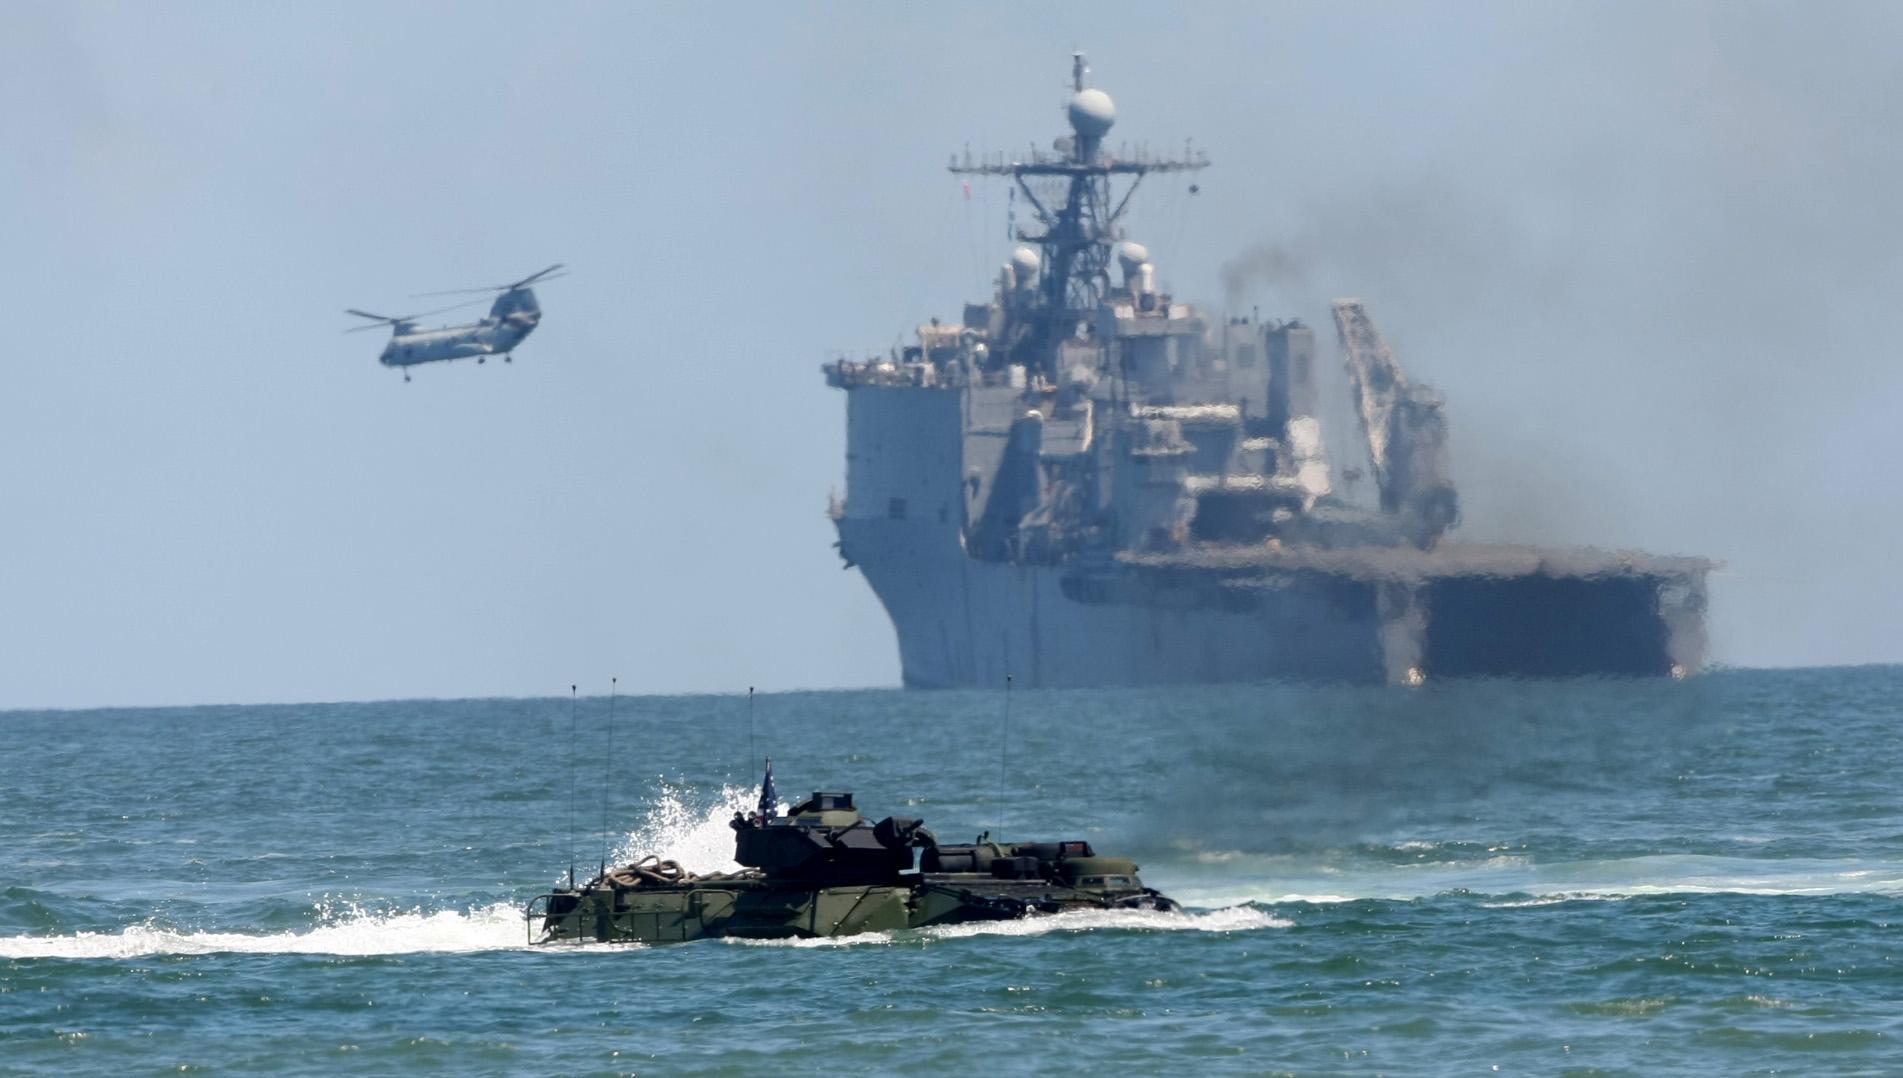 US_Navy_090425-M-9917S-235_Amph.jpg